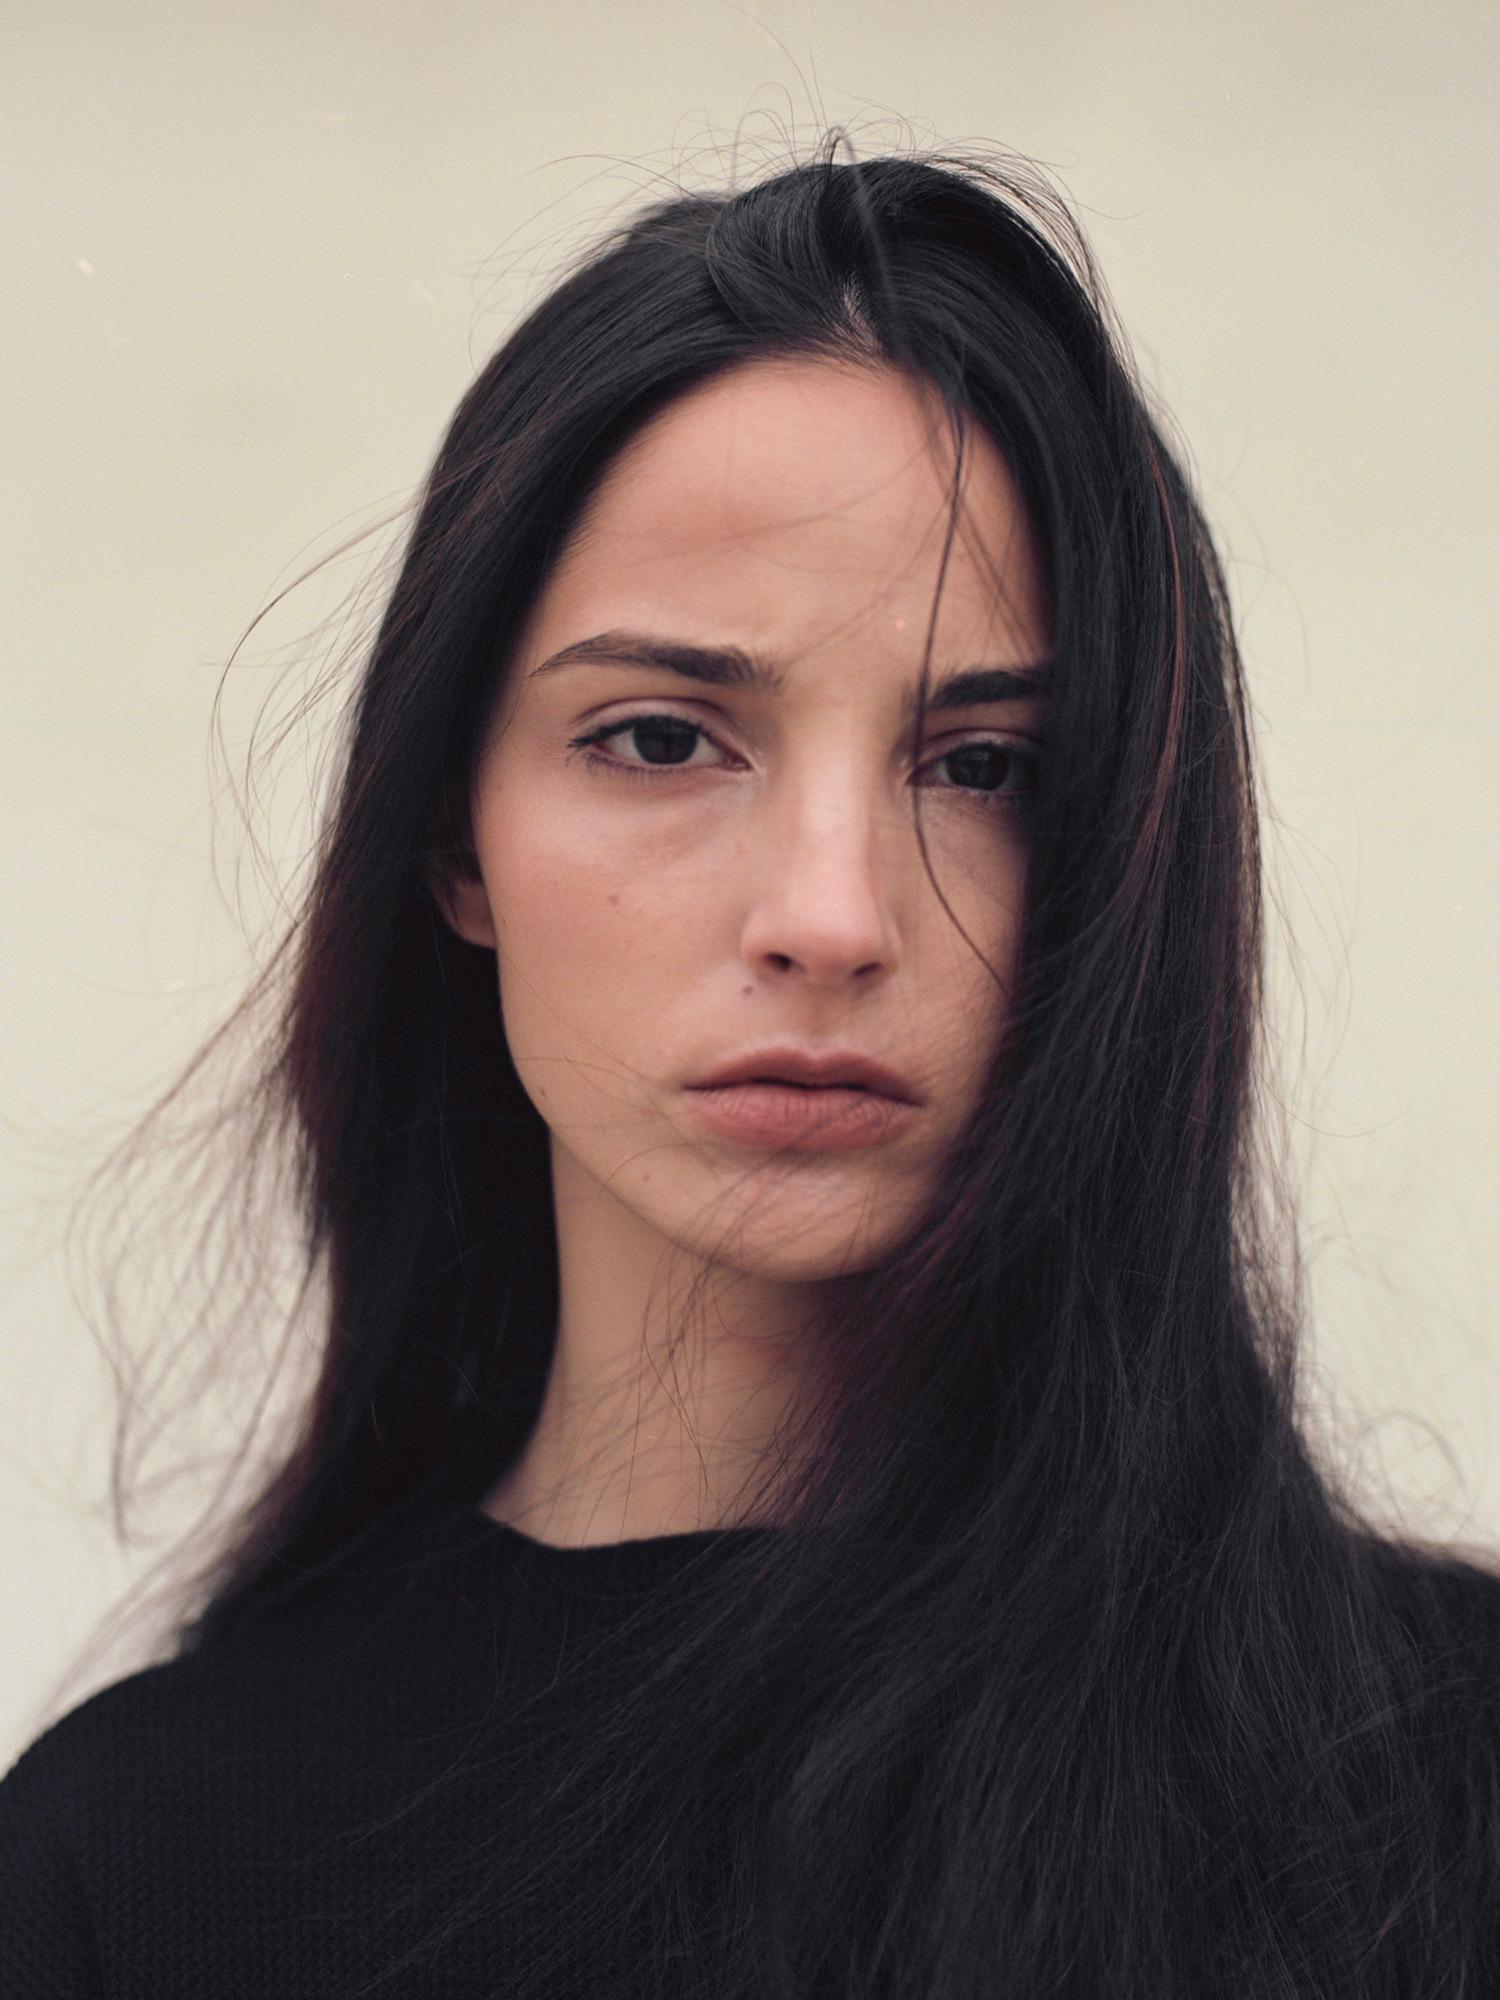 NATALIA JUGHELI